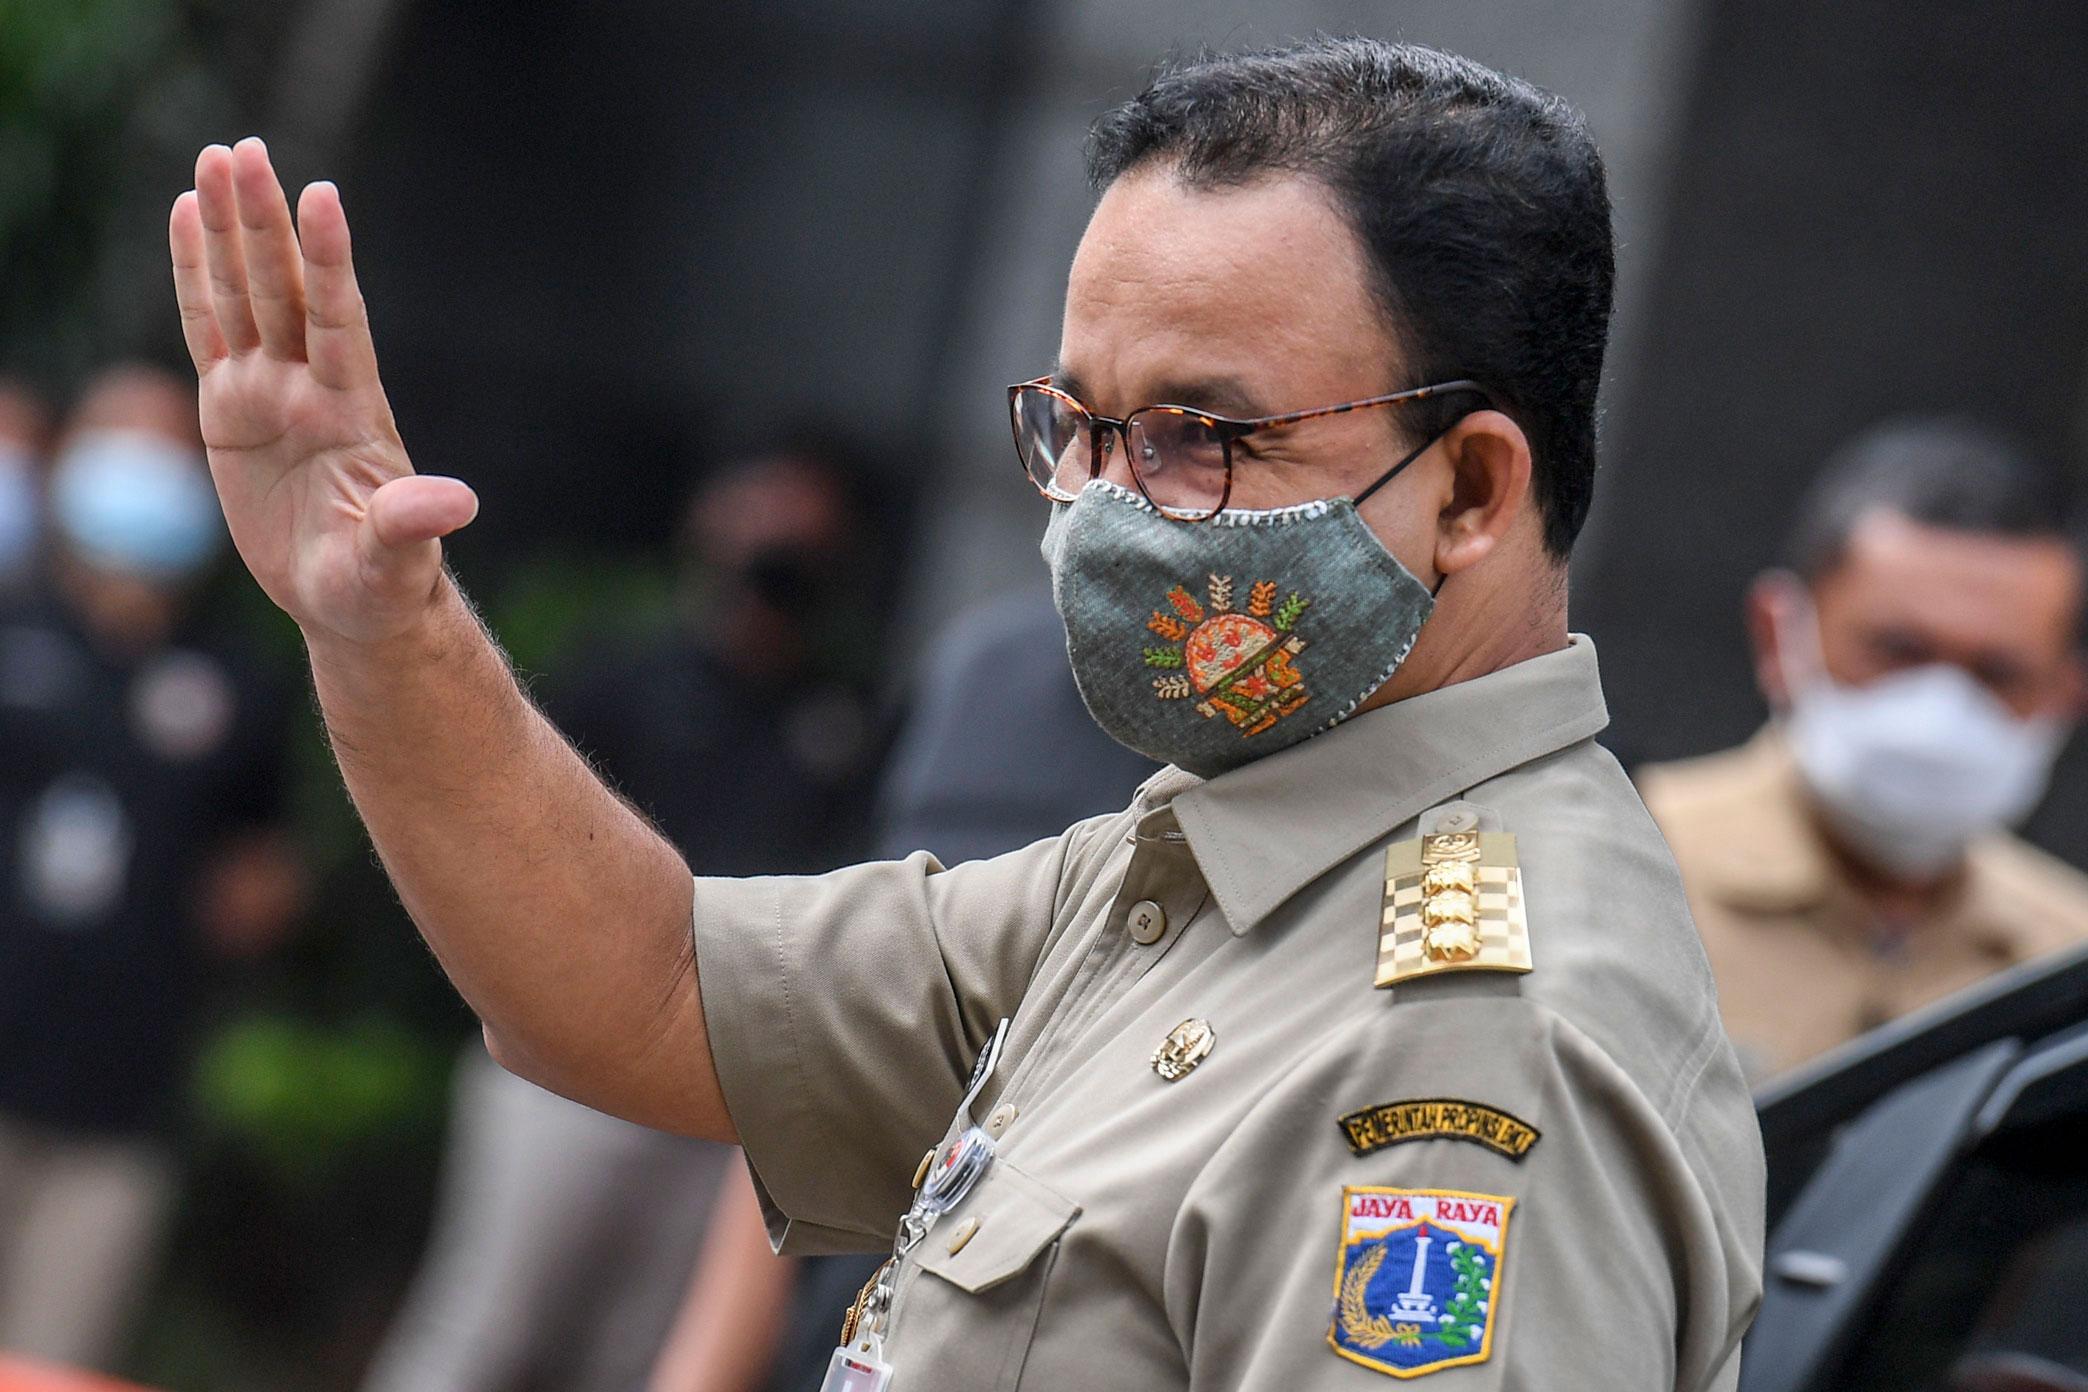 Gubernur DKI JakartaAnies Baswedan dinyatakan telah NegatifCovid-19